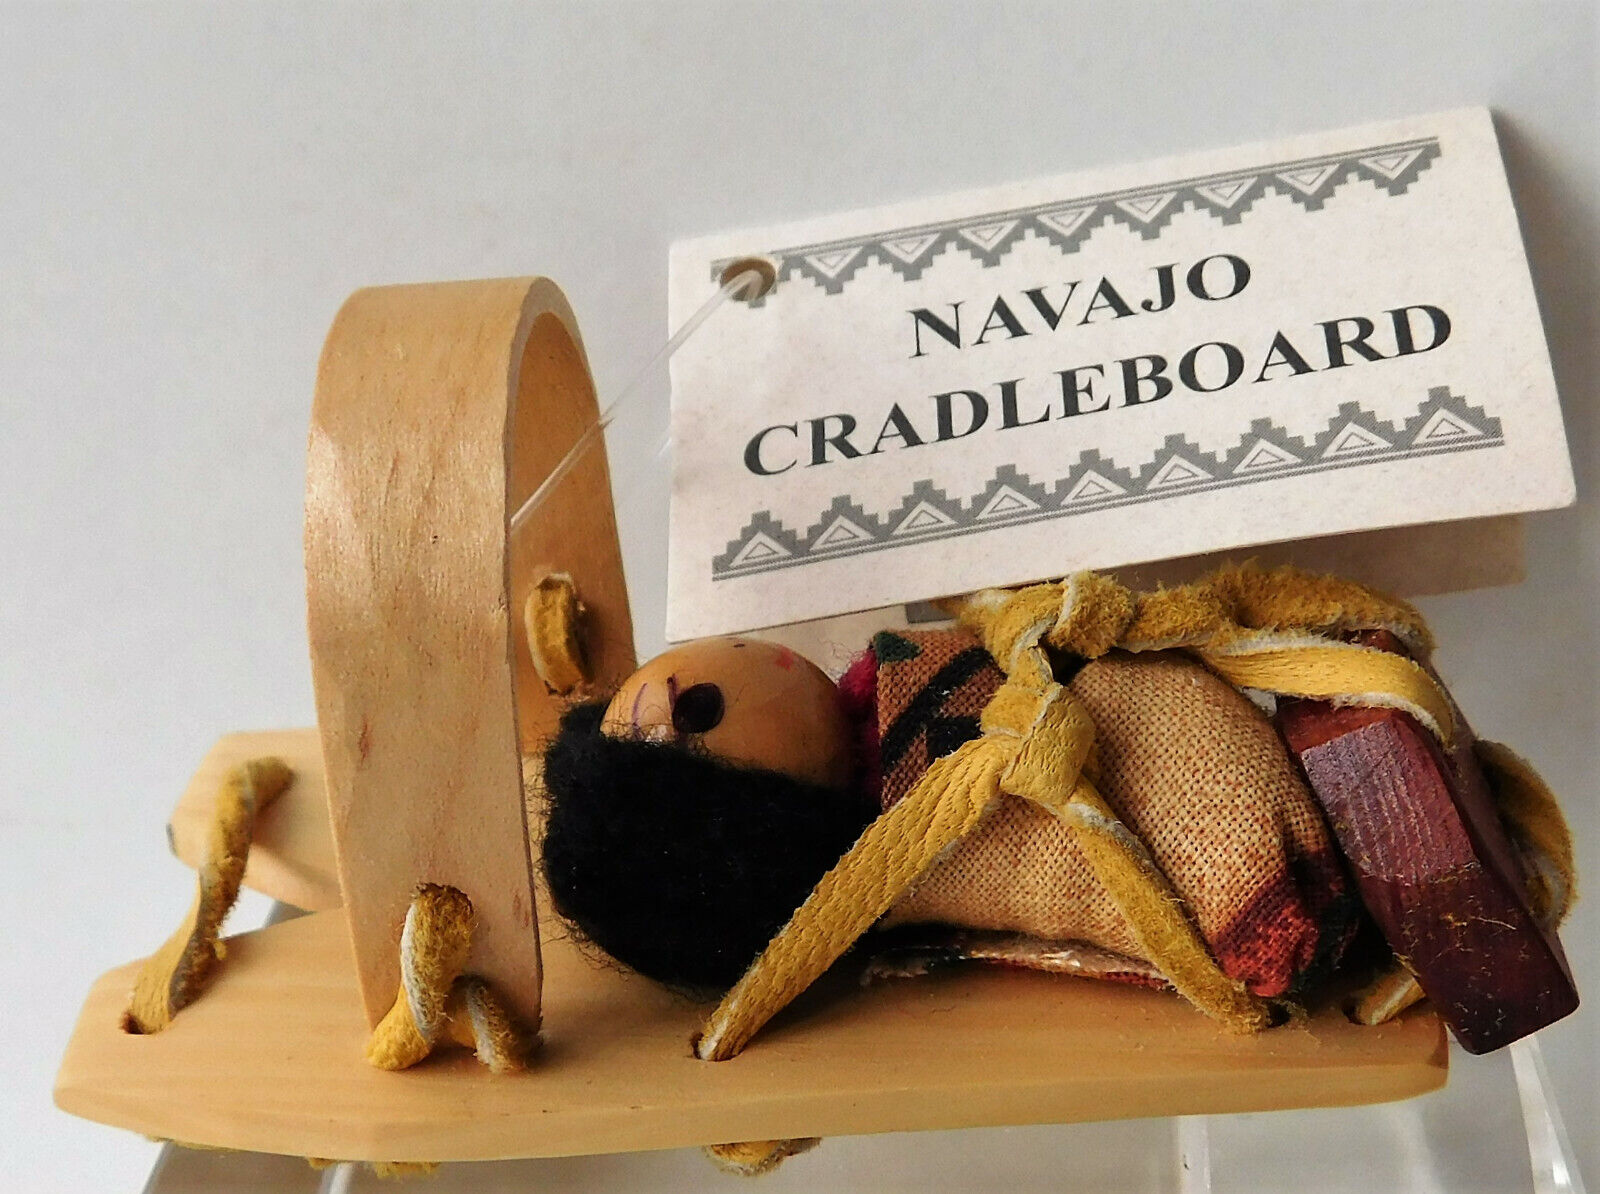 Miniature Navajo doll baby on mini cradle-board Lisa Curtis Native American art